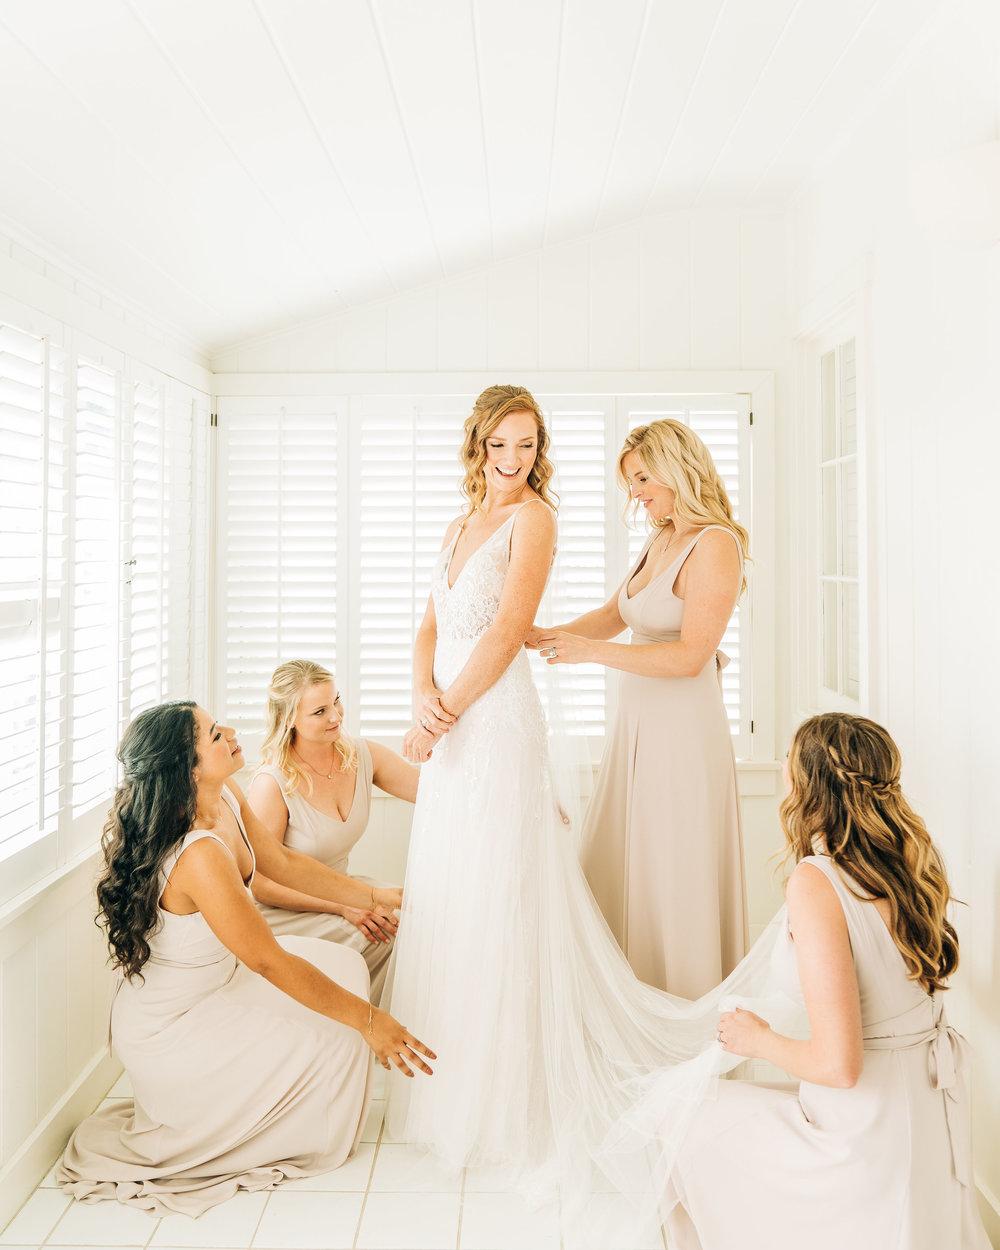 allie-shupe-tyler-wiggins-wedding-santa-barbara 039.jpg